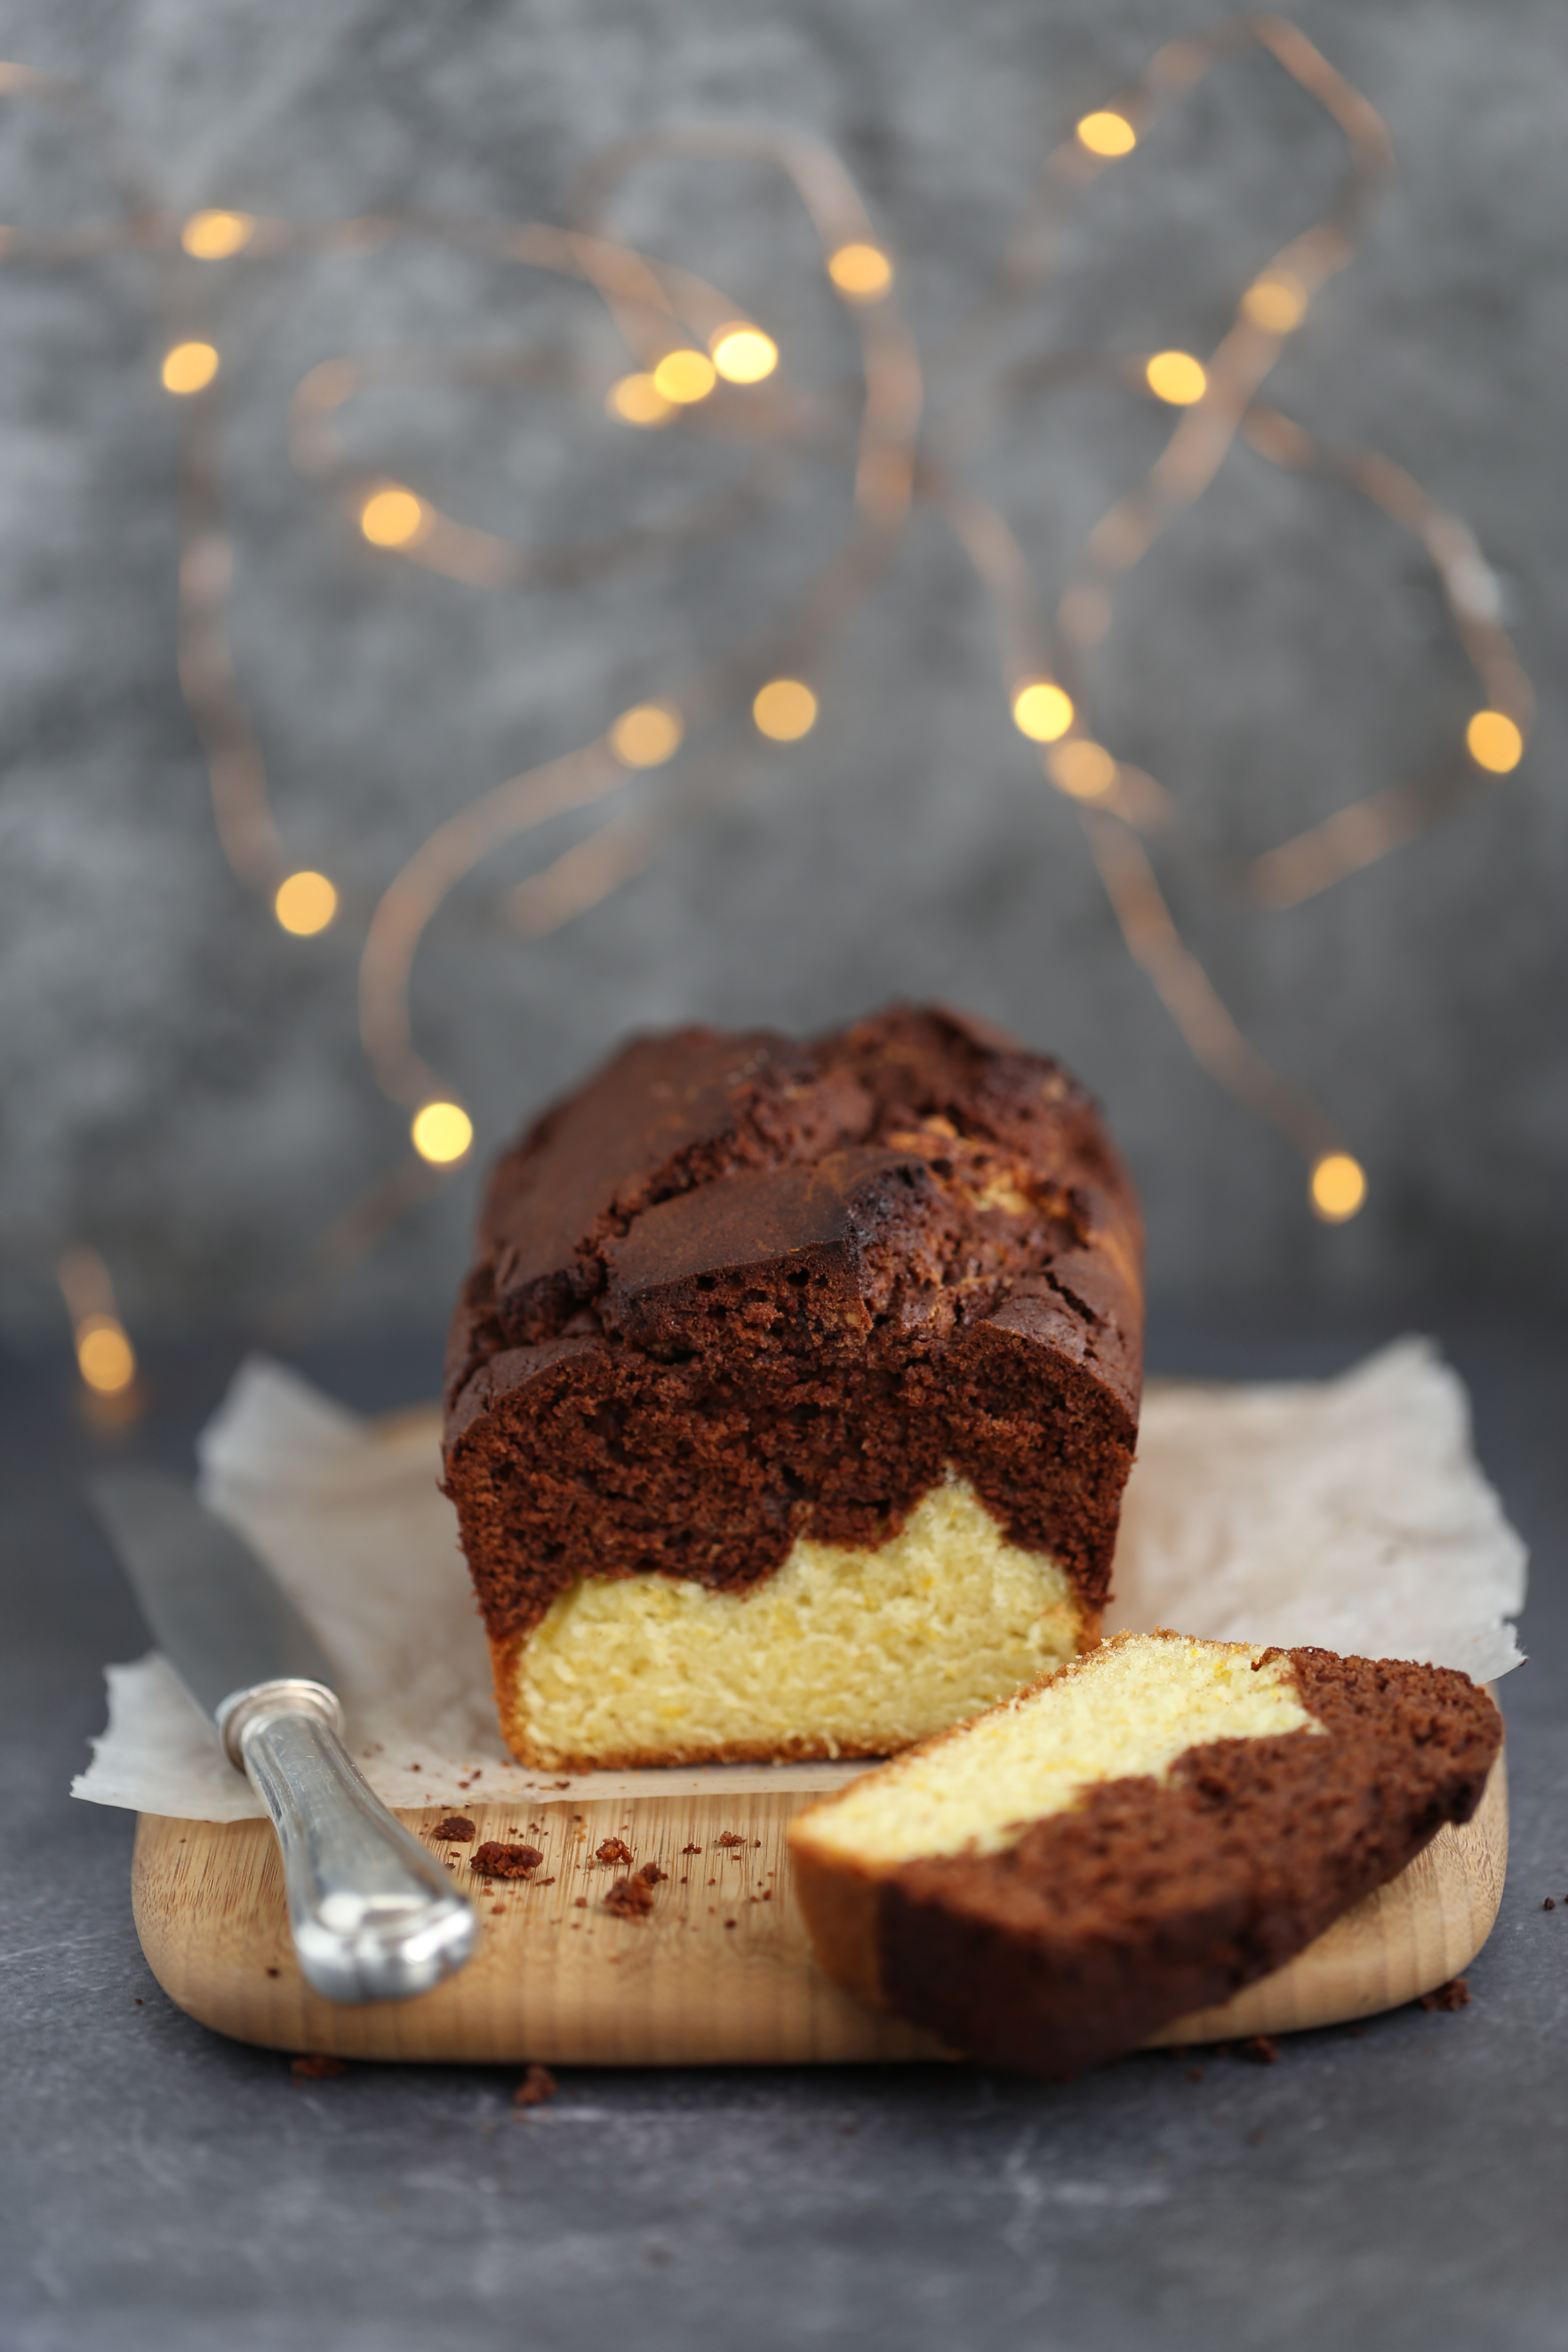 Cake choco-orange - marble cake -Delimoon.com